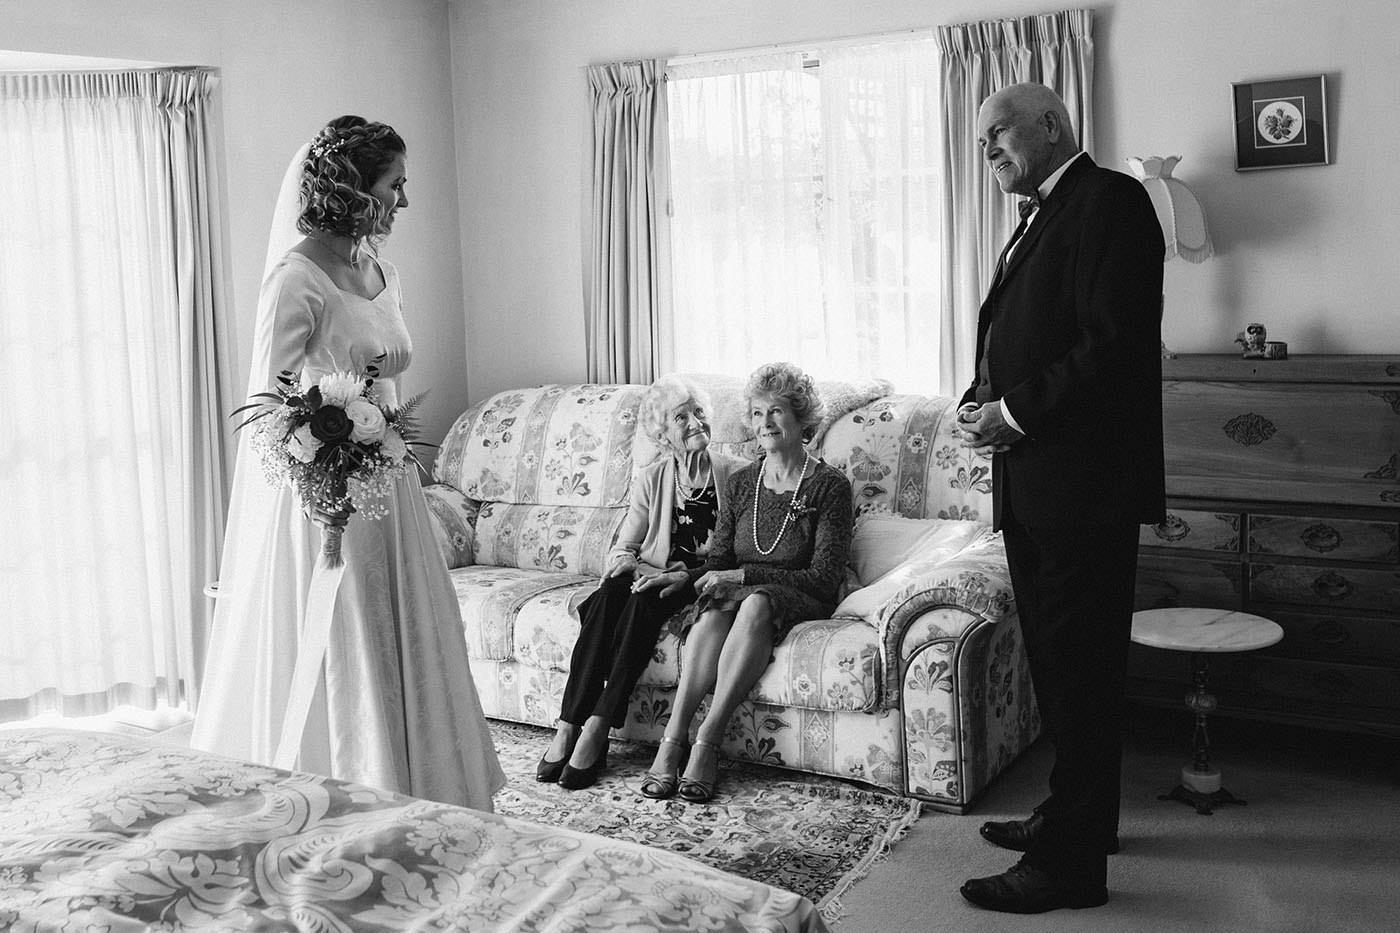 wedding_photographer_nz-00074.jpg